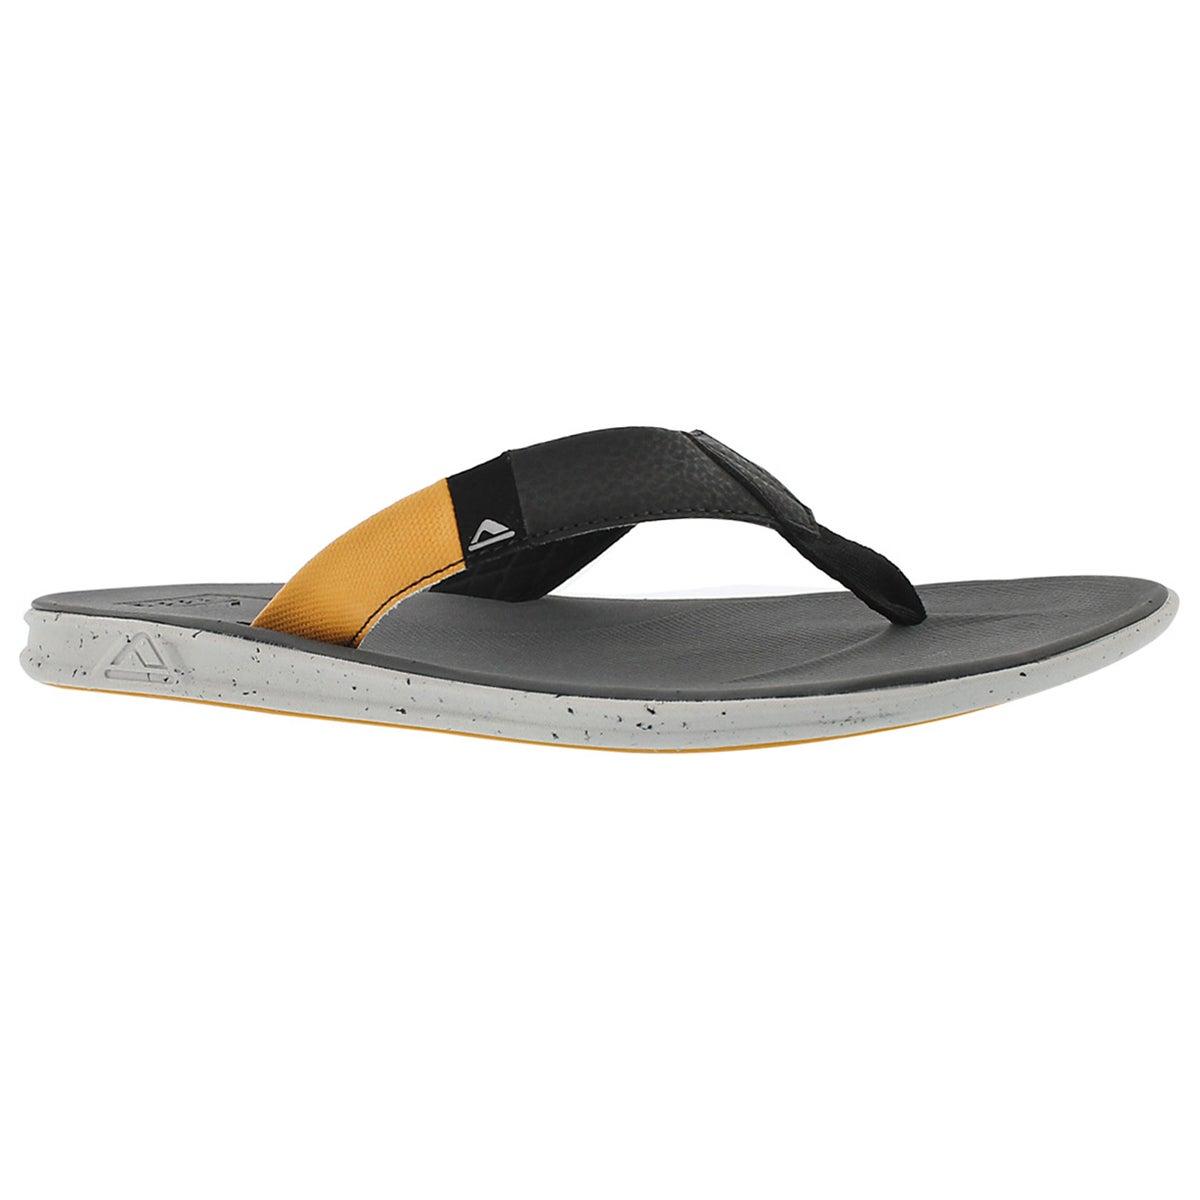 Mns Slammed Rover blk/yllw thong sandal